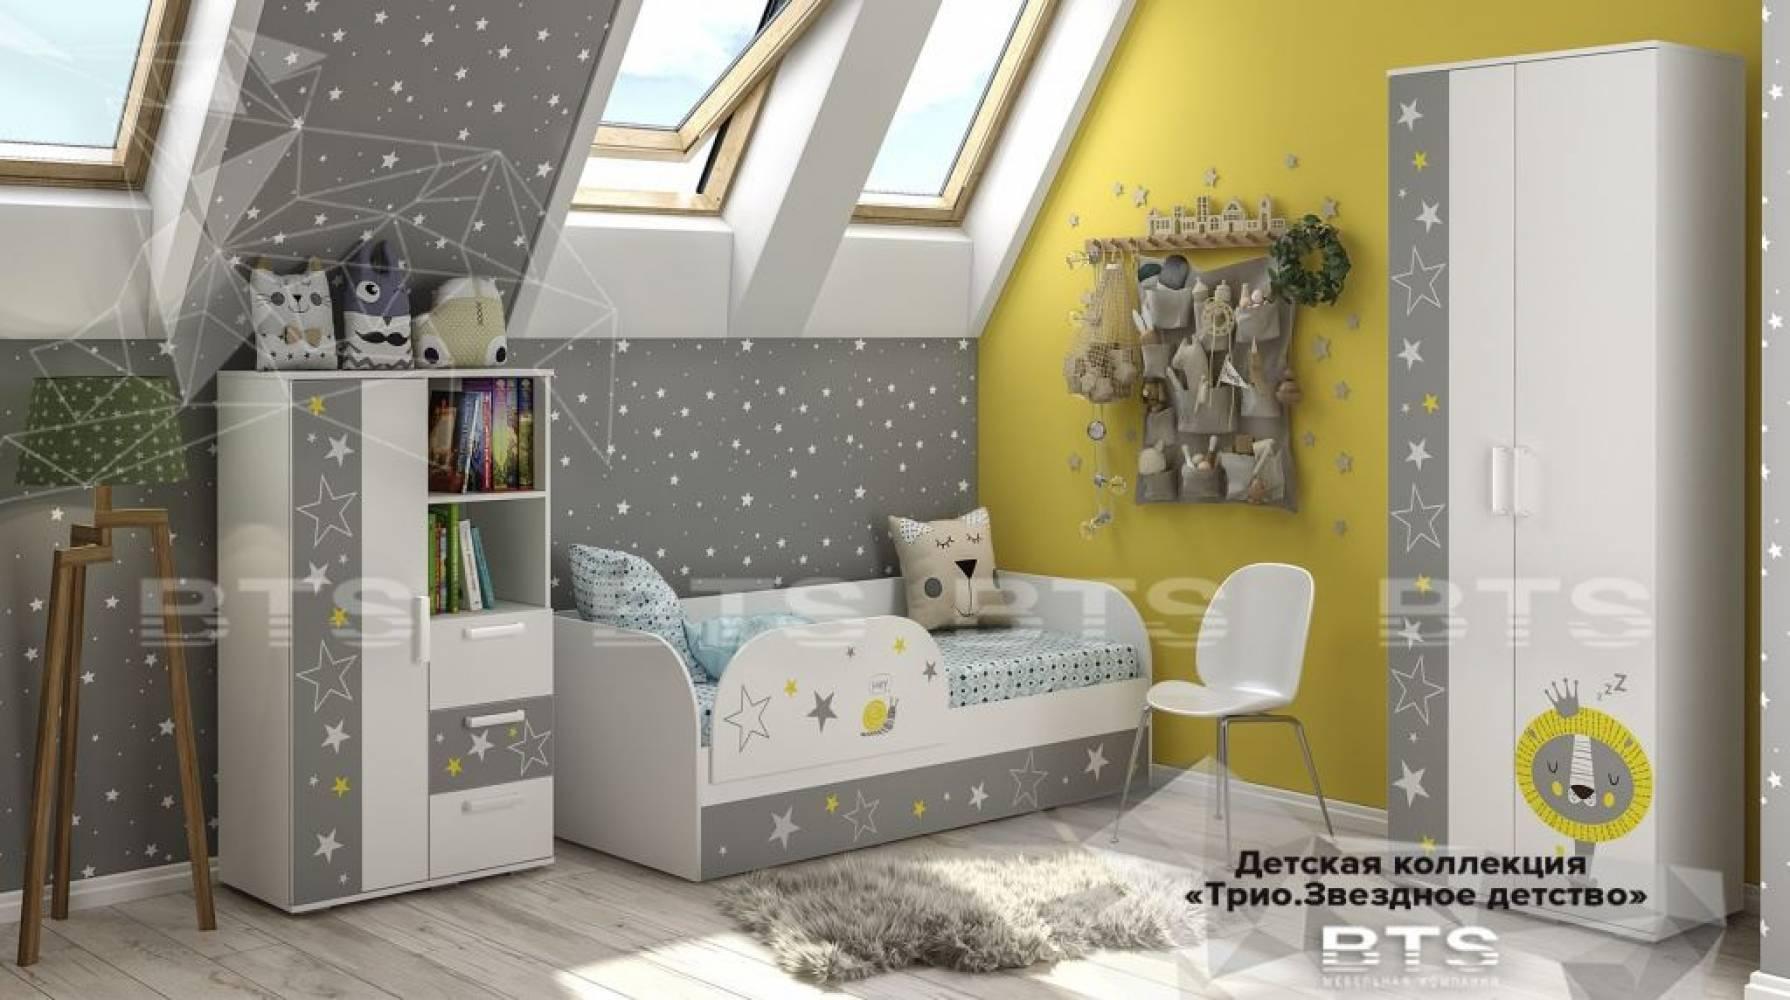 Детская комната Трио Звездное детство, комплект 2